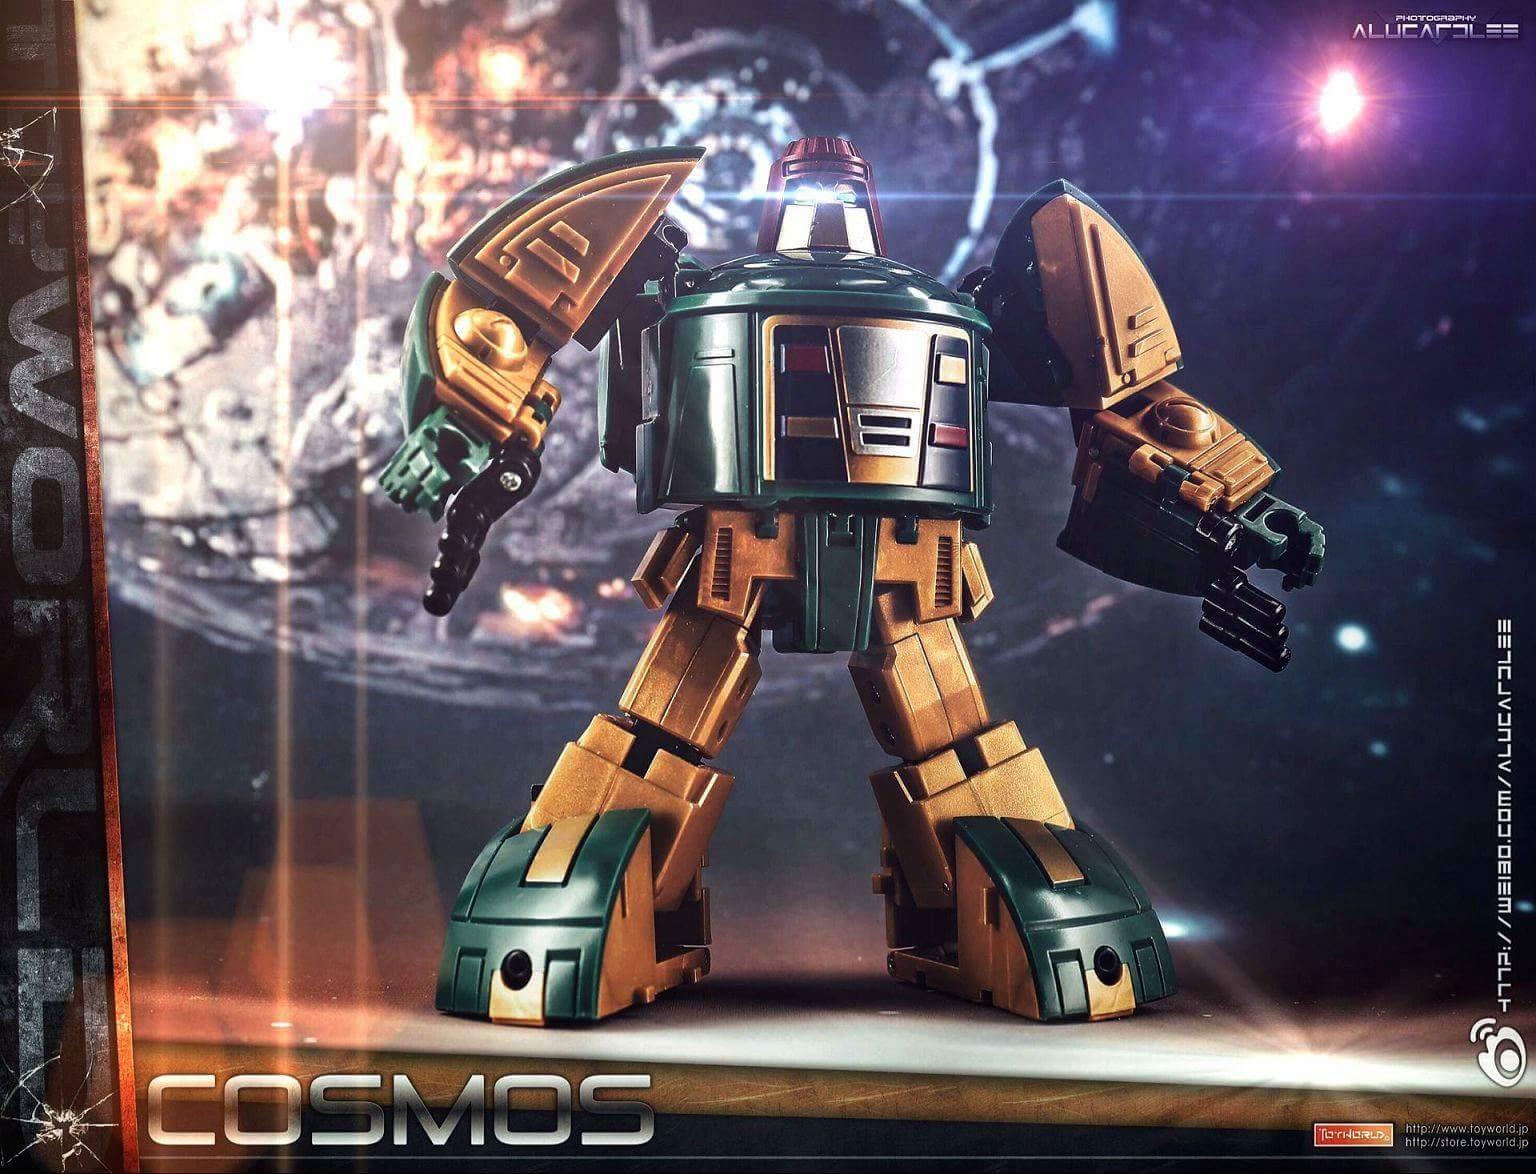 [Toyworld][Zeta Toys] Produit Tiers - Minibots MP - Gamme EX - Page 2 7dz1lq4J